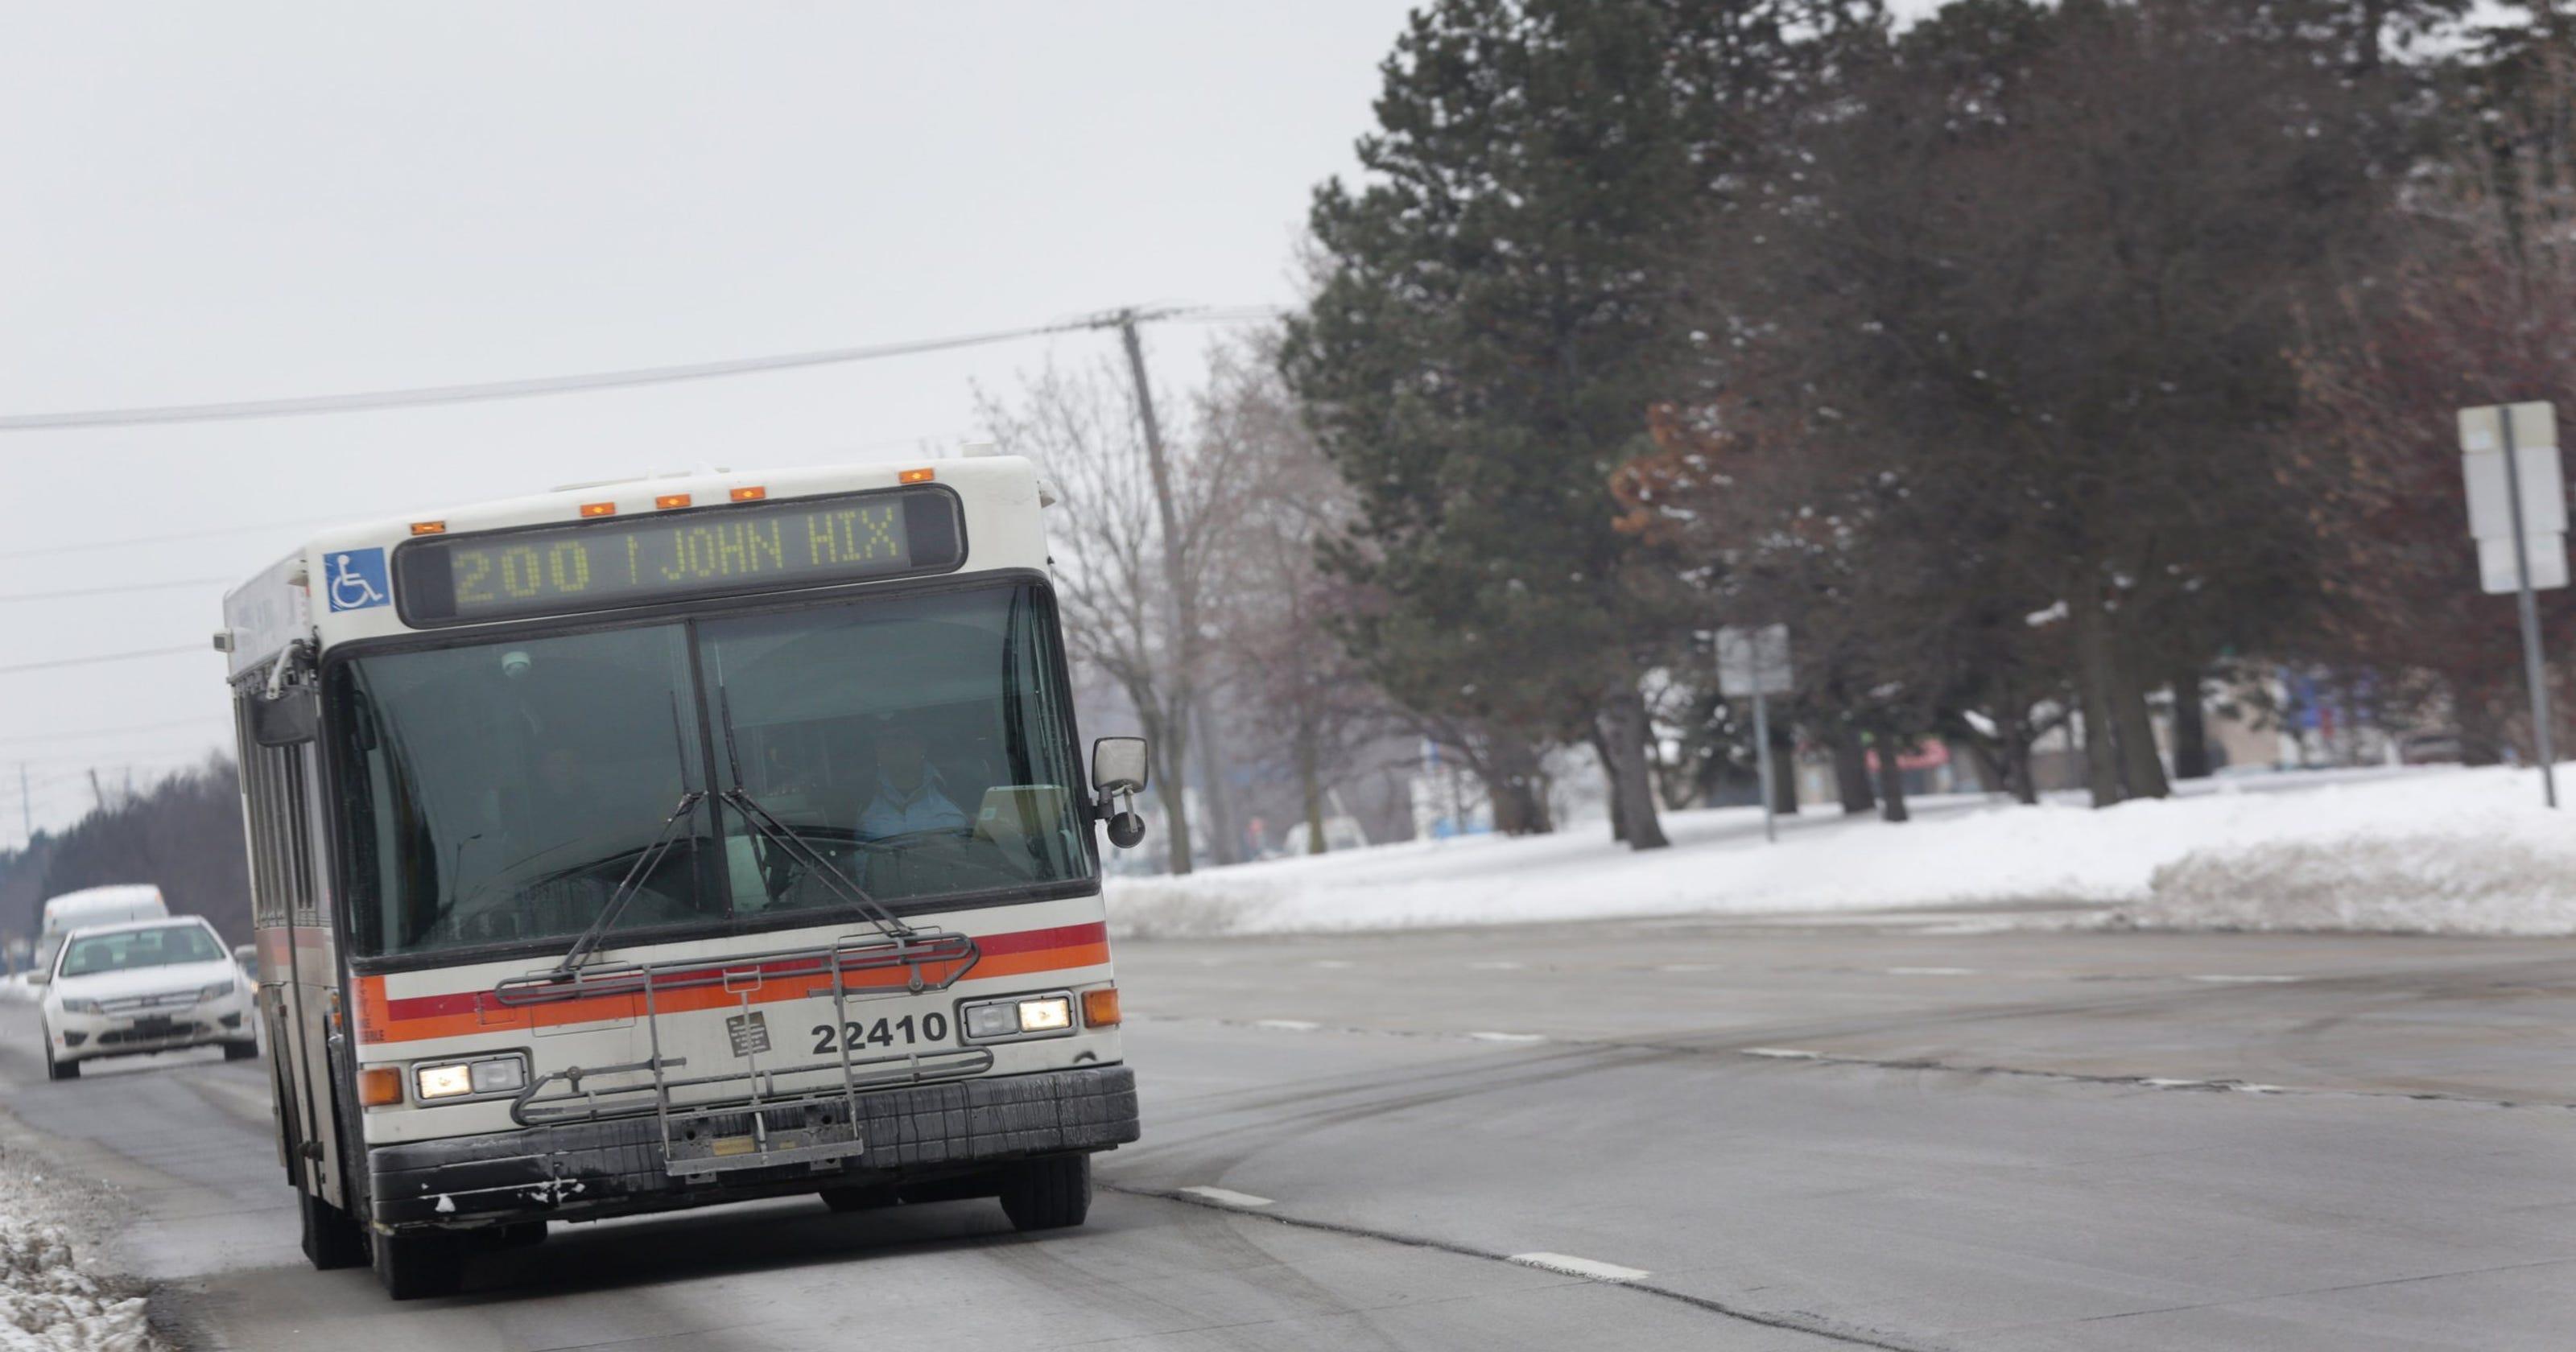 metro detroit's transit is designed to fail